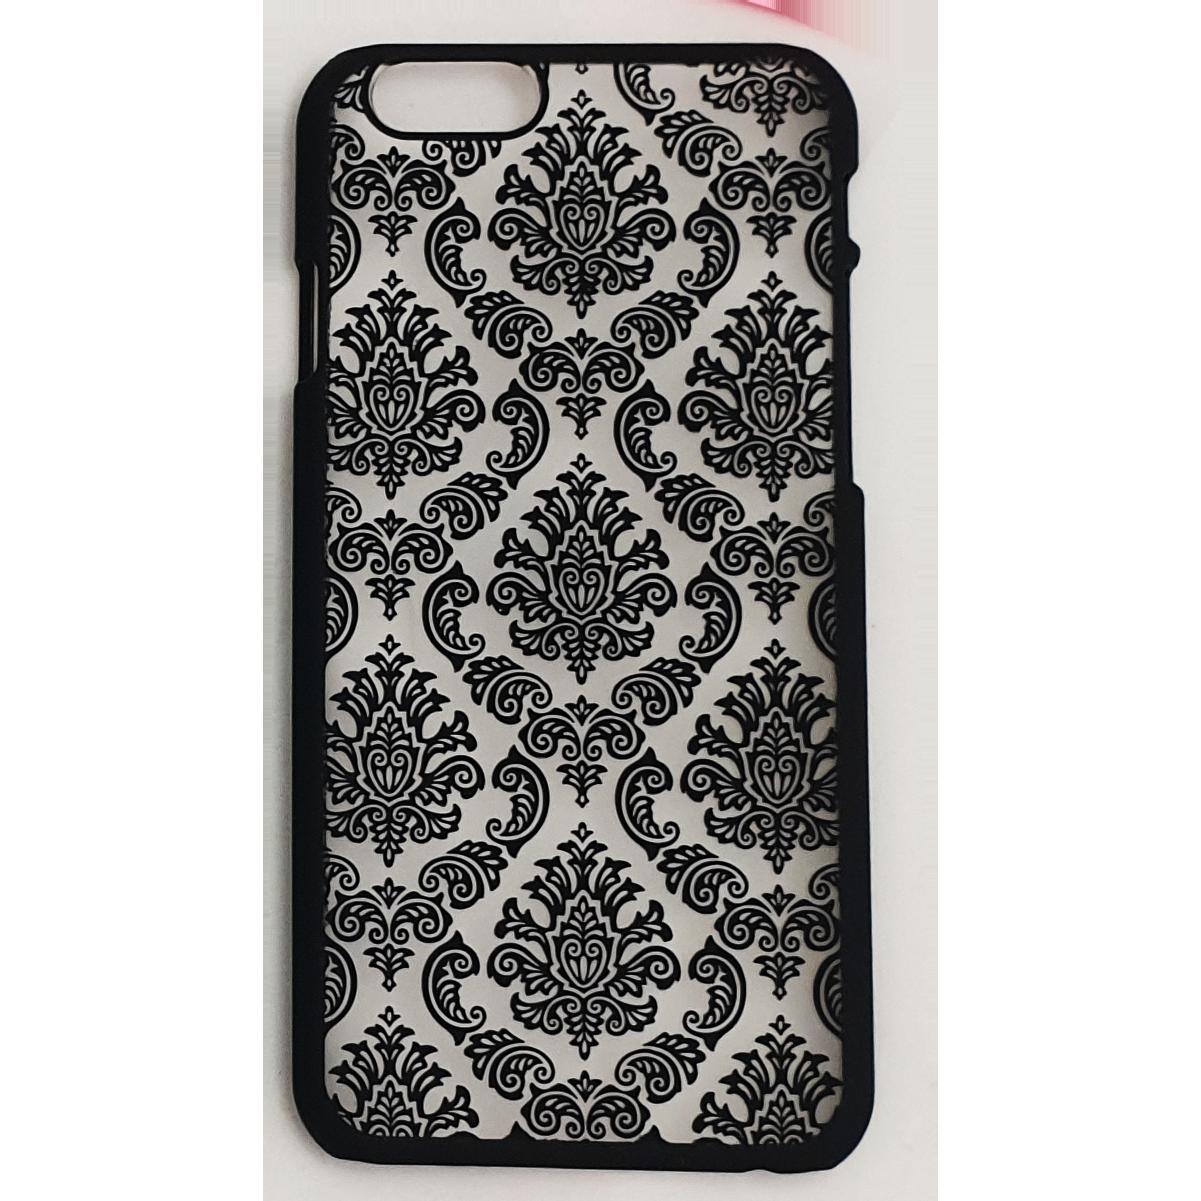 Mobilskal iPhone 6 / 6S Spetsmönster Svart